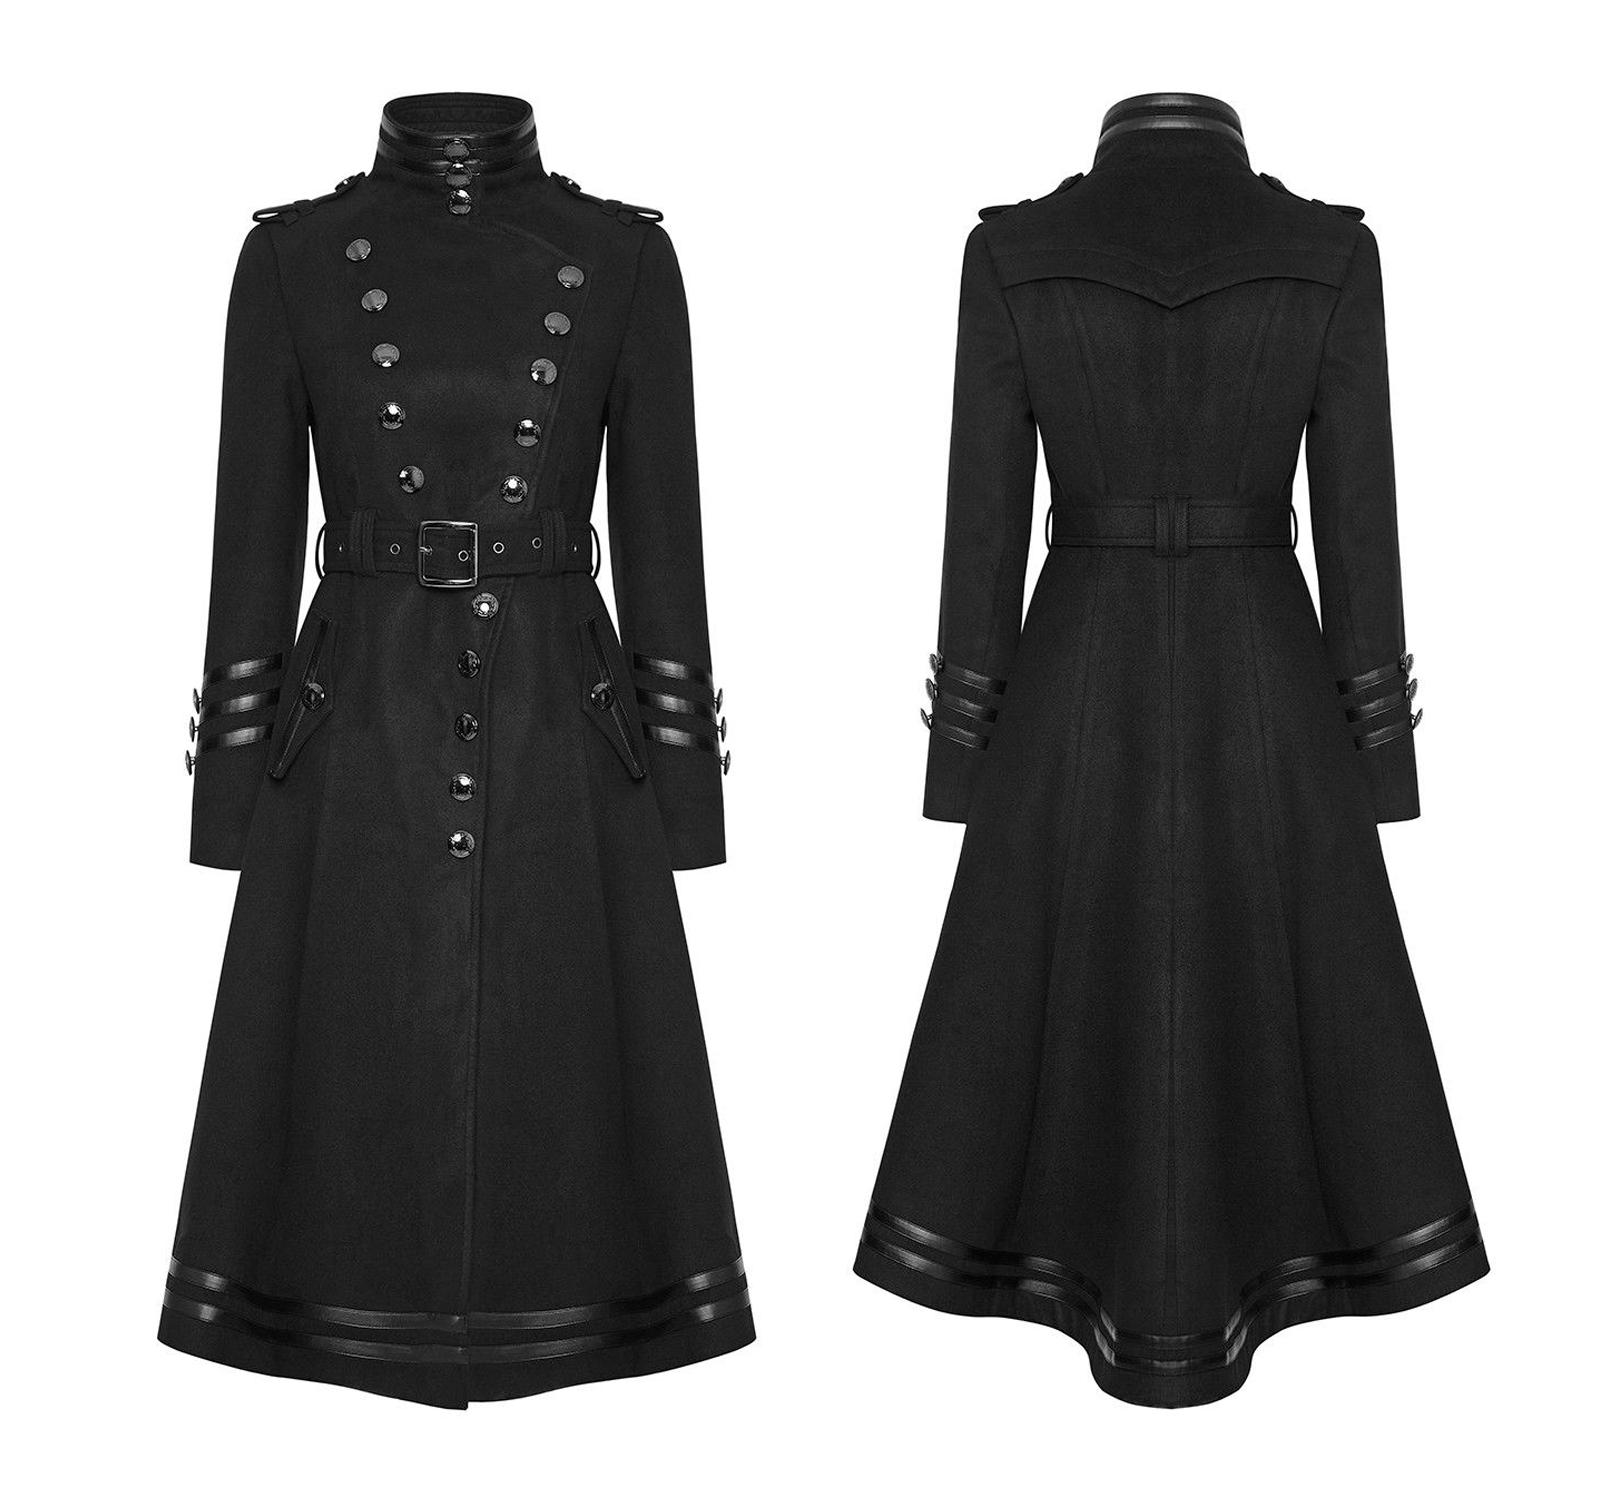 Gothic Women Steampunk Military Coat Black Punk Ladies Uniform Long